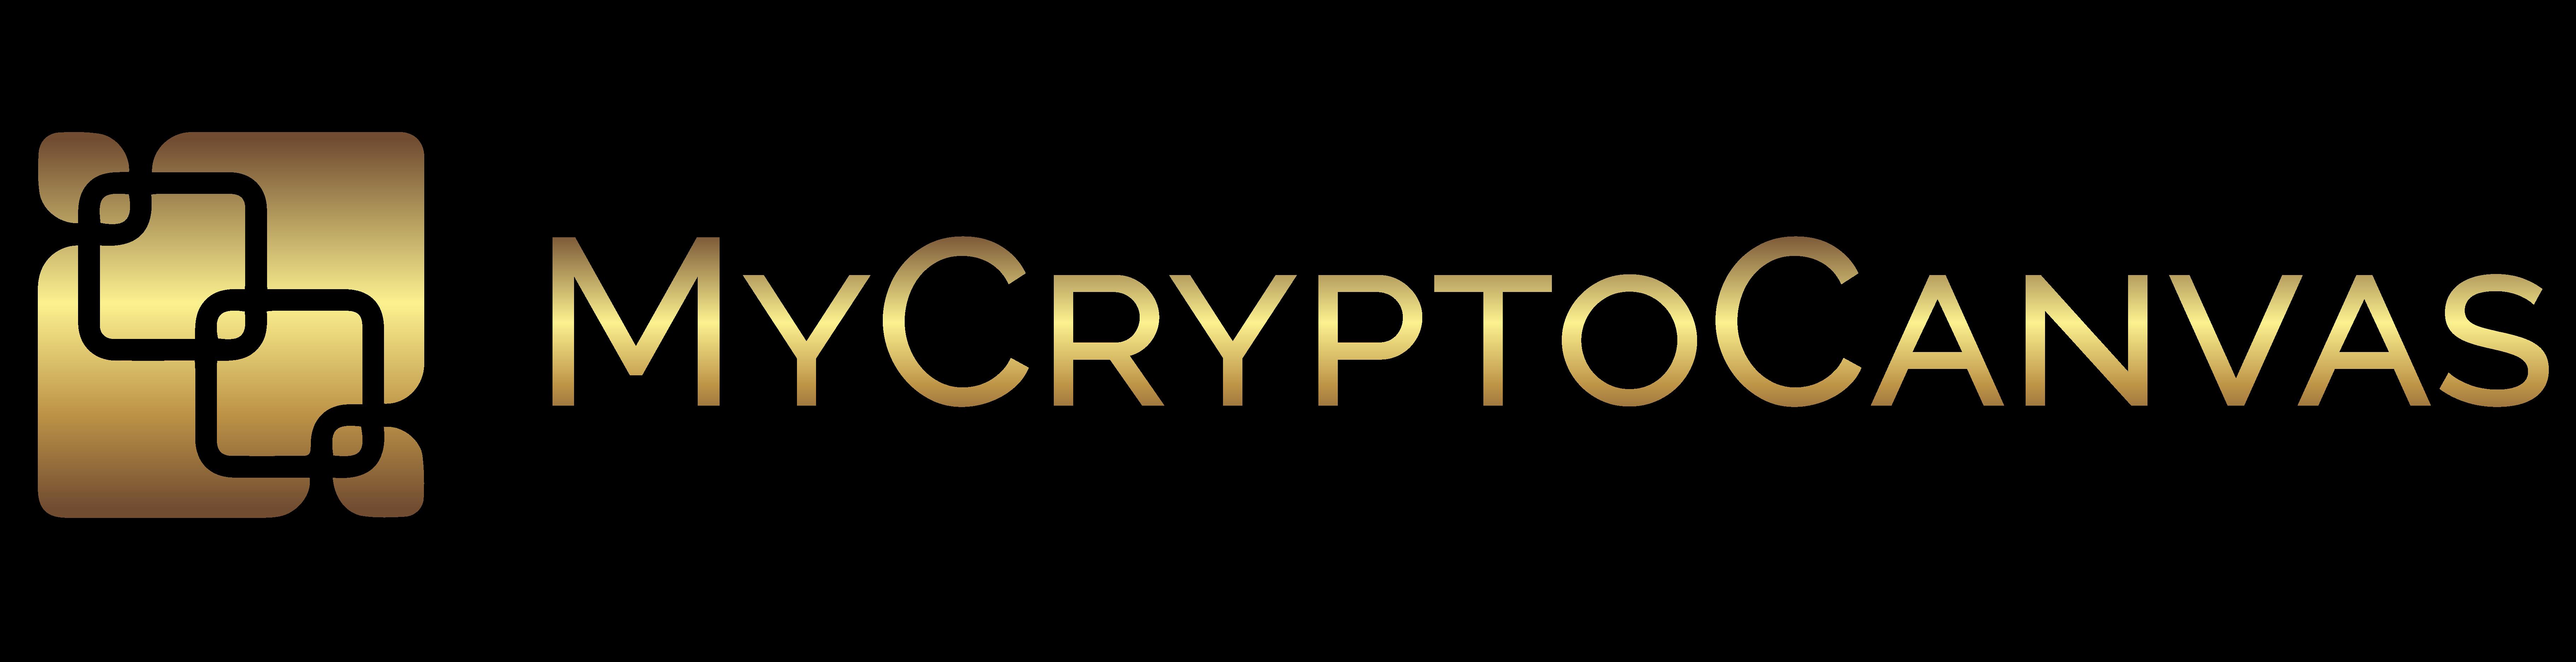 My Crypto Canvas Voucher Code